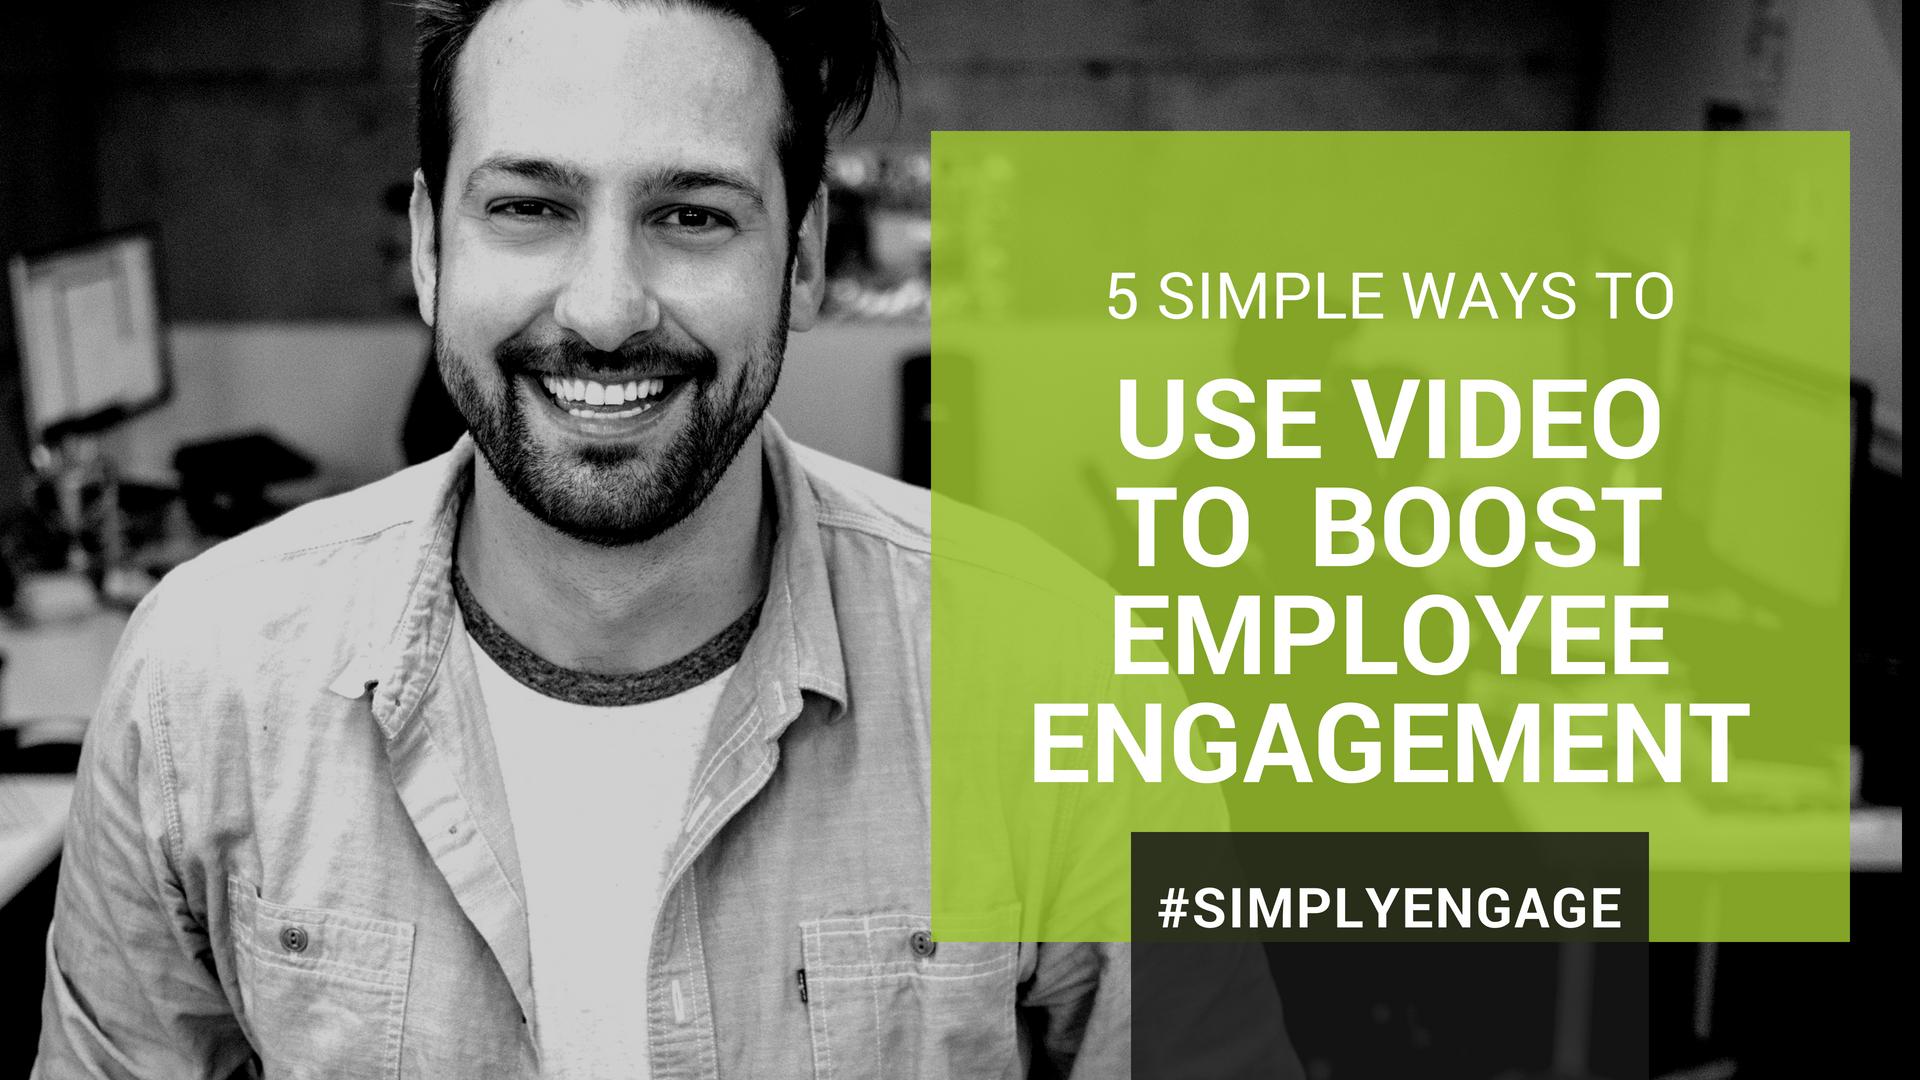 Blog Title - Video Employee Engagement